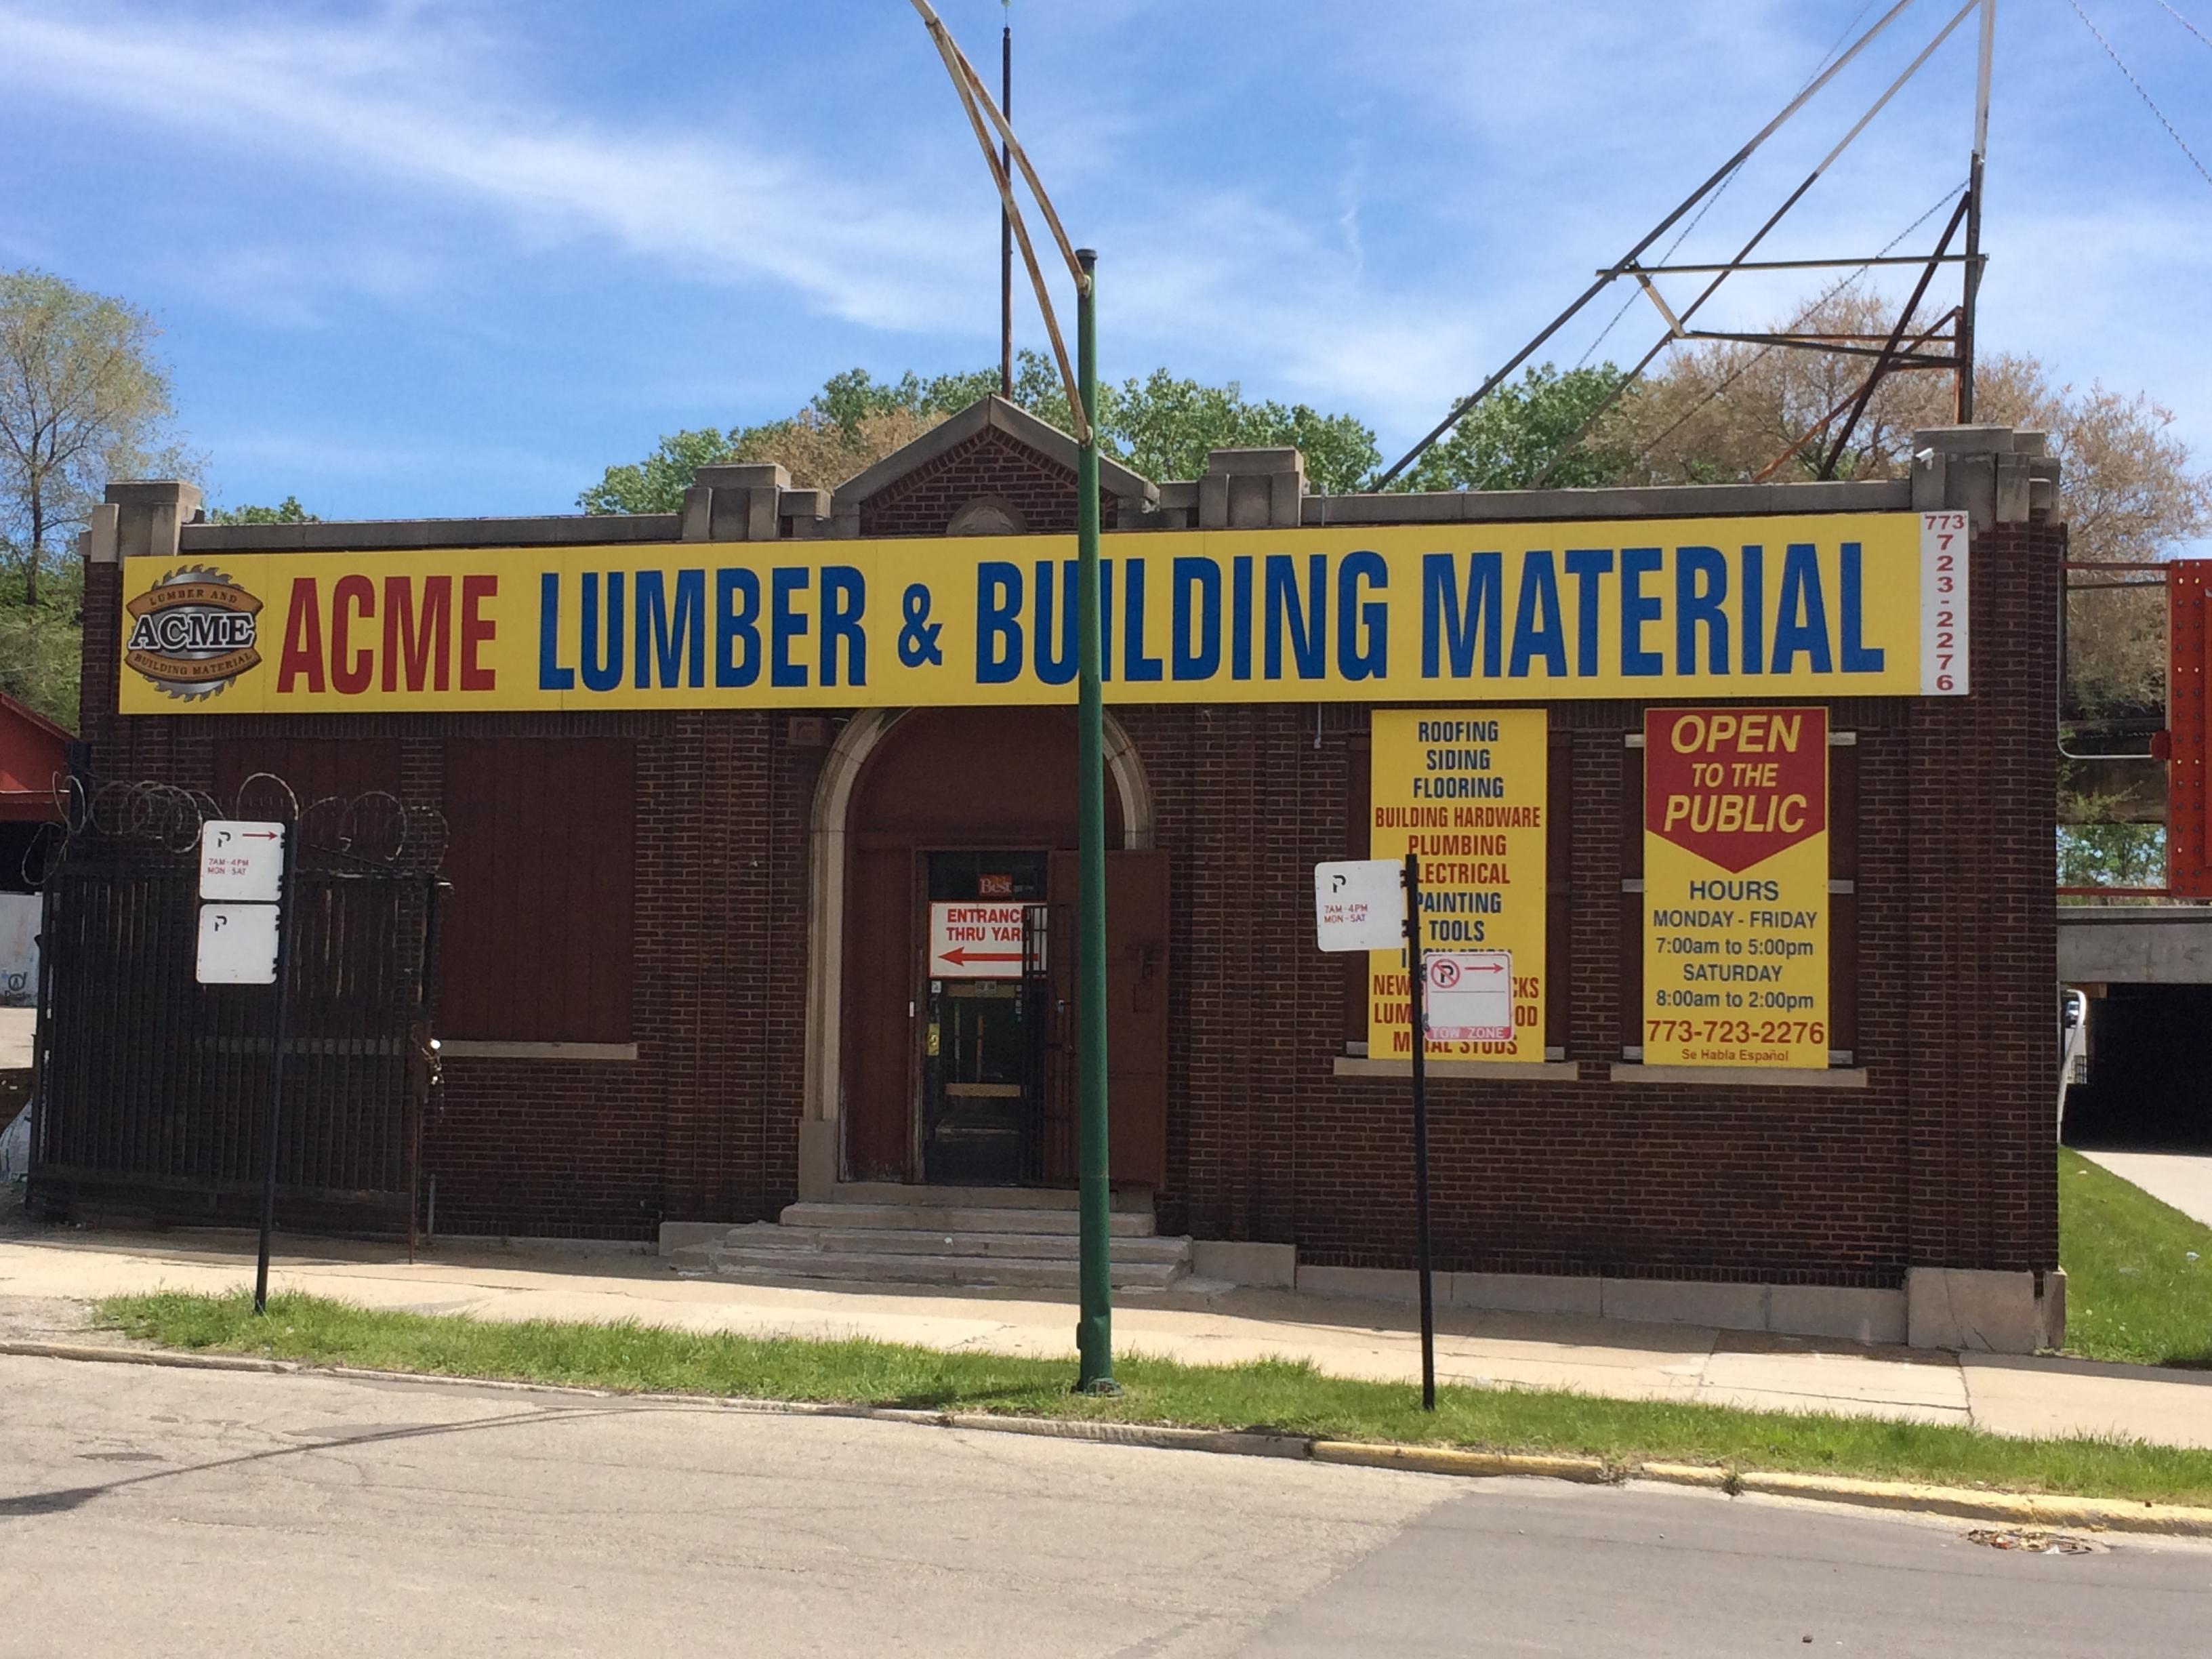 Acme Lumber